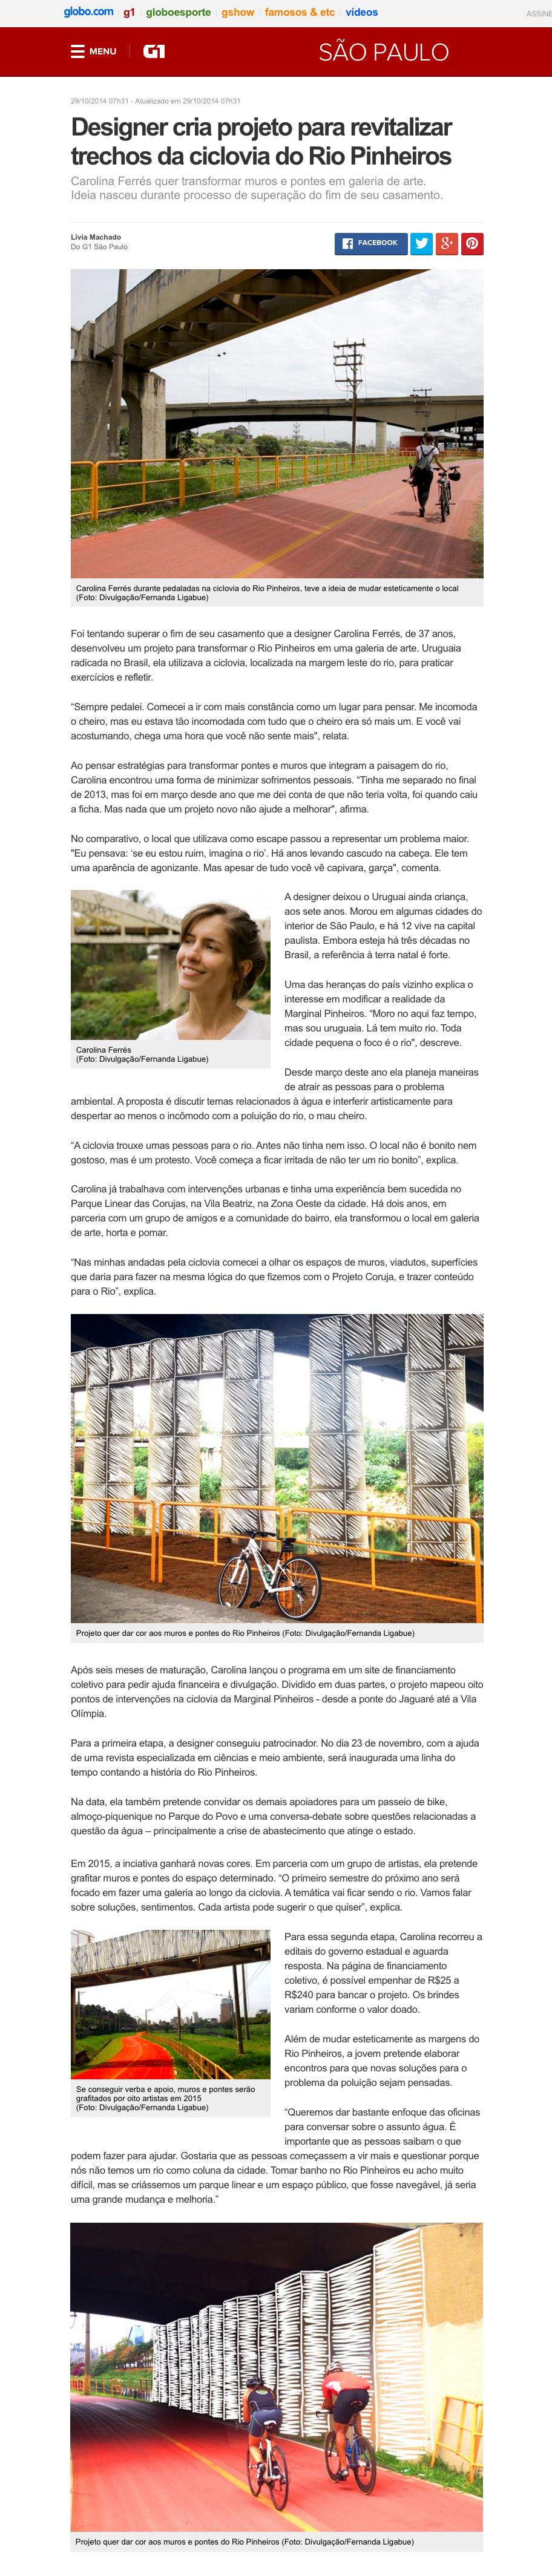 Designer creates project to revitalize Pinheiros River banks